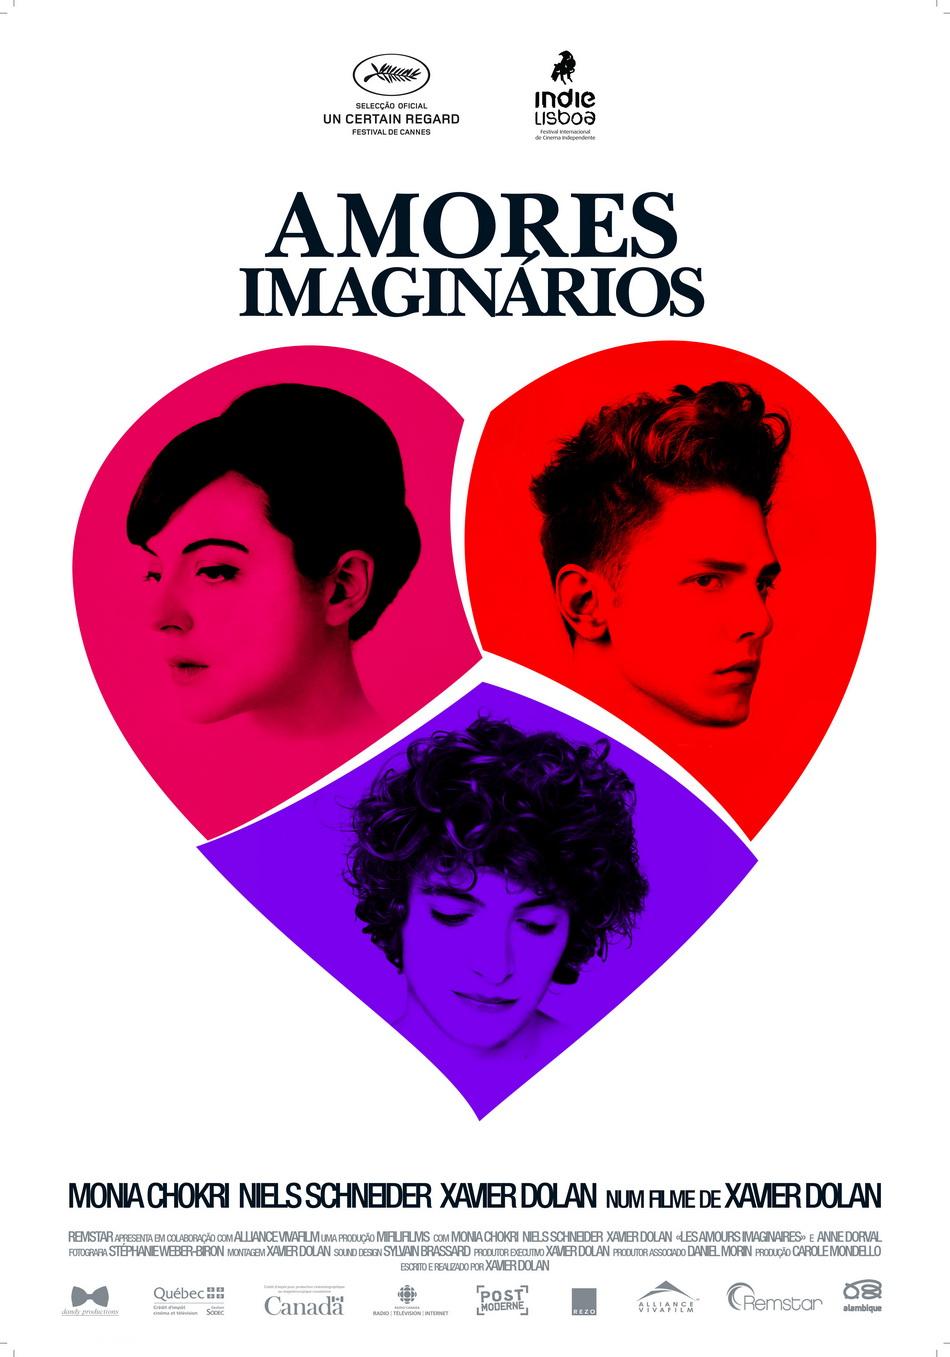 02-amores imag